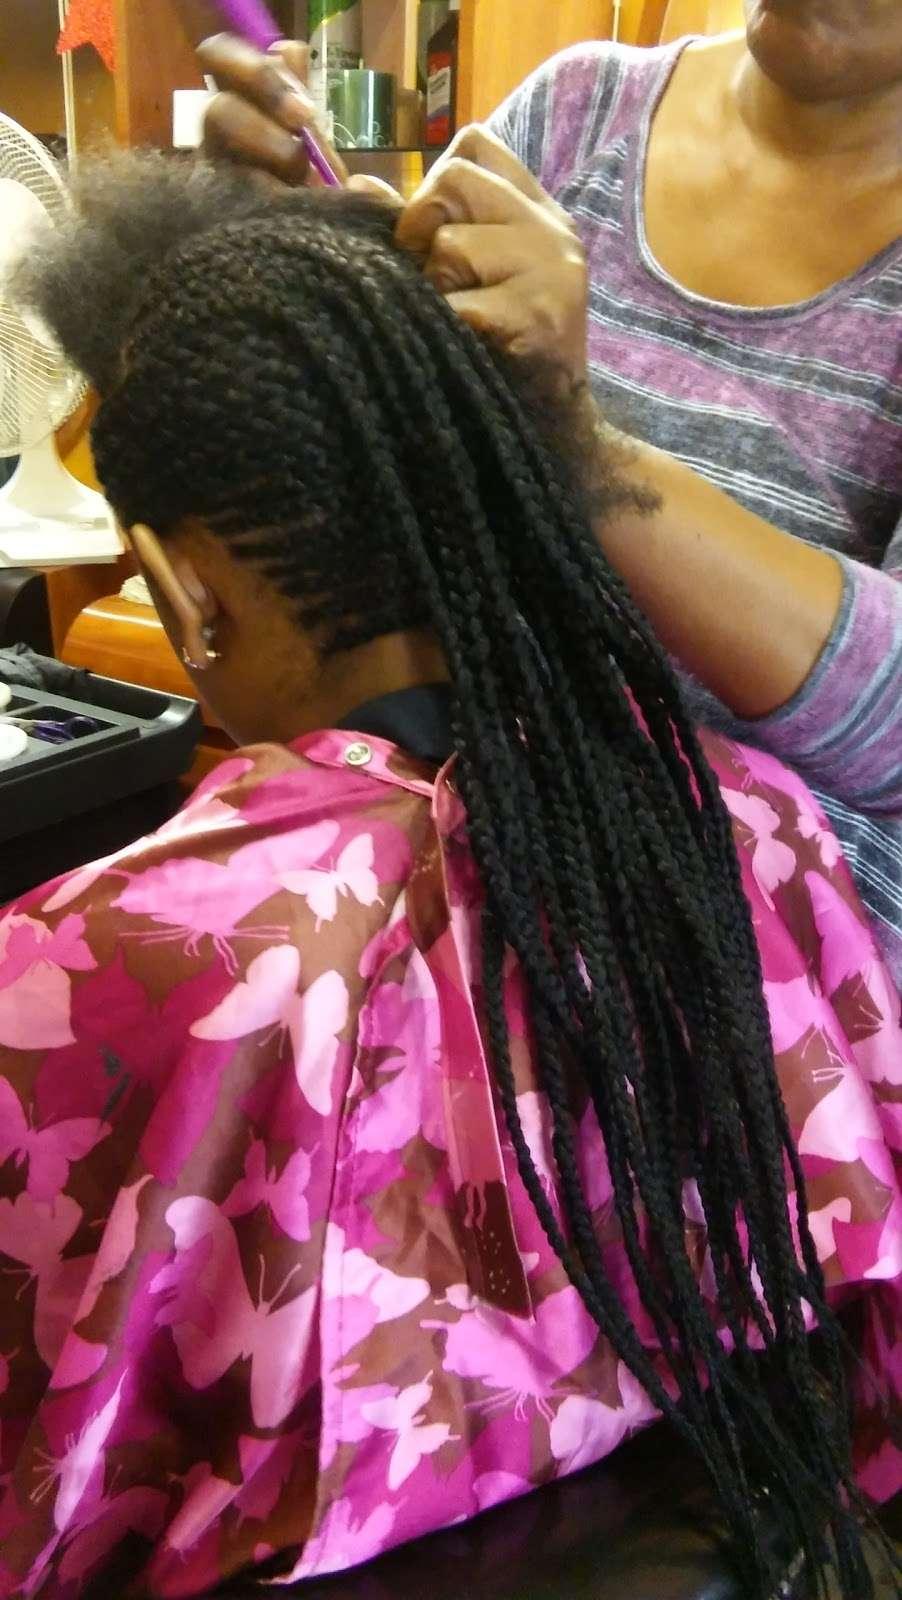 Posh Unisex Beauty Salon - hair care    Photo 3 of 10   Address: Springdale Ave, East Orange, NJ 07017, USA   Phone: (973) 519-1990